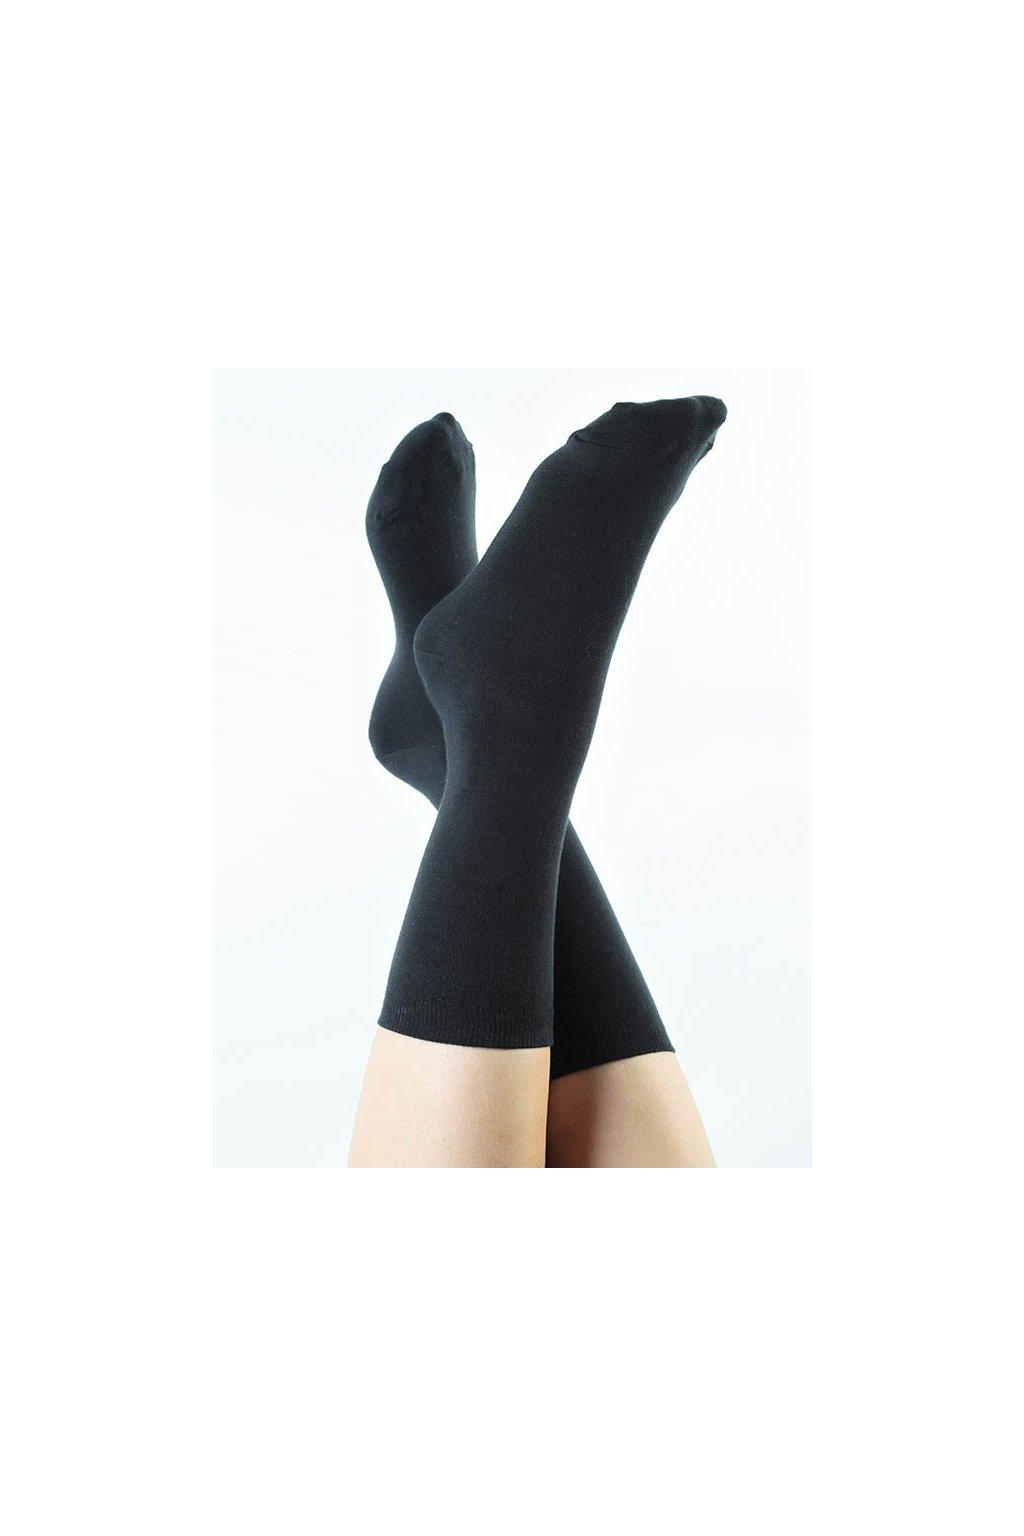 Ponožky z biobavlny - černé (Velikost 35-38)